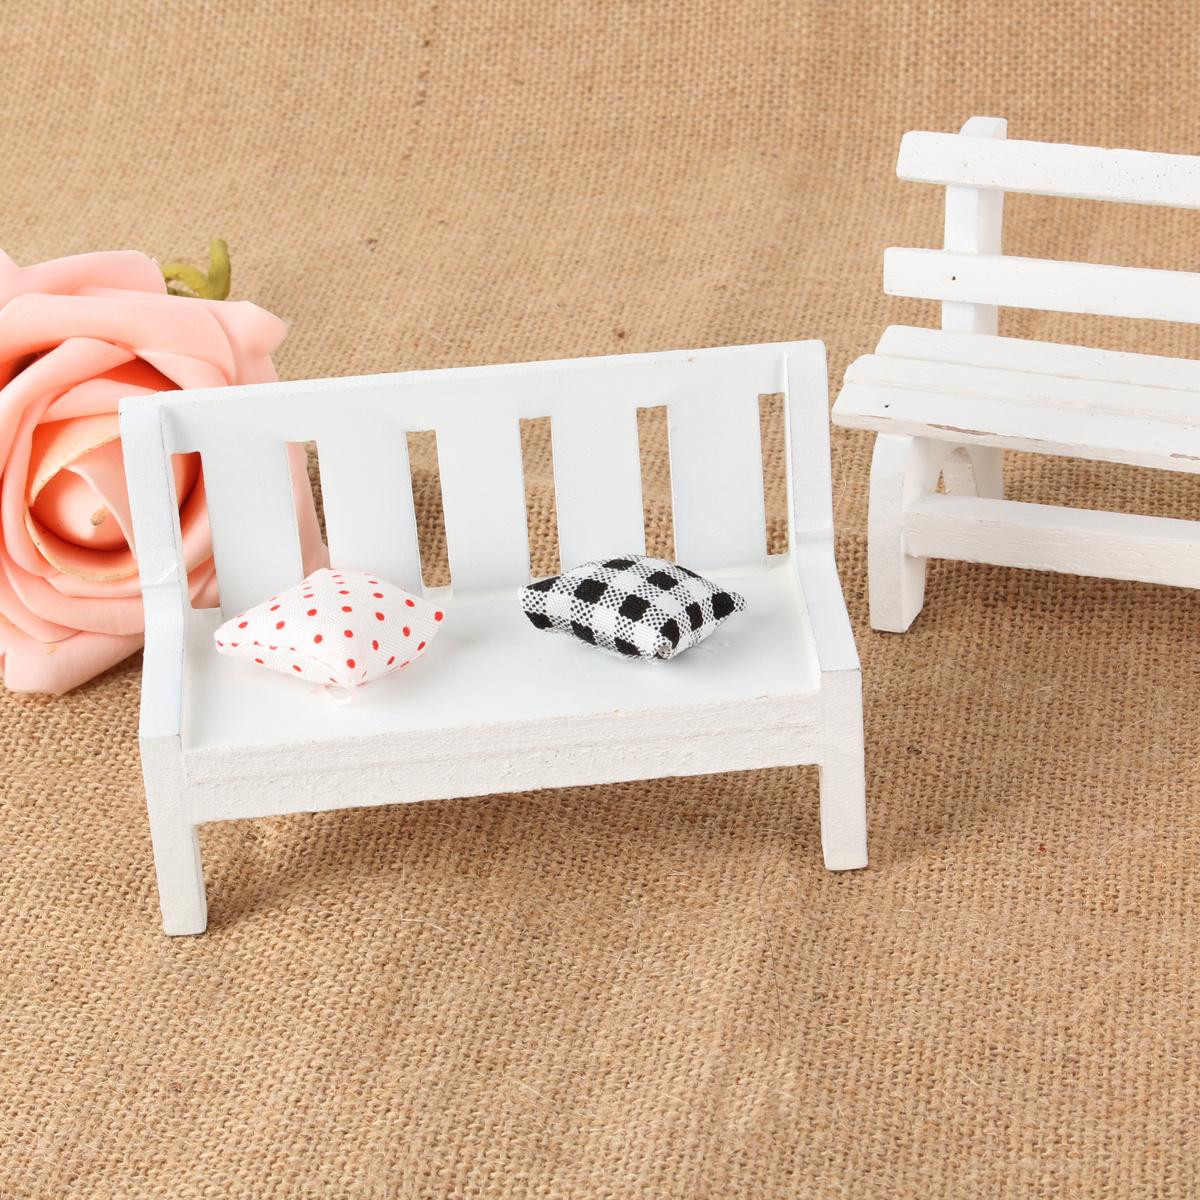 mini liegestuhl stuhl gartenm bel deckstuhl puppenhaus zubeh r chair bench ebay. Black Bedroom Furniture Sets. Home Design Ideas